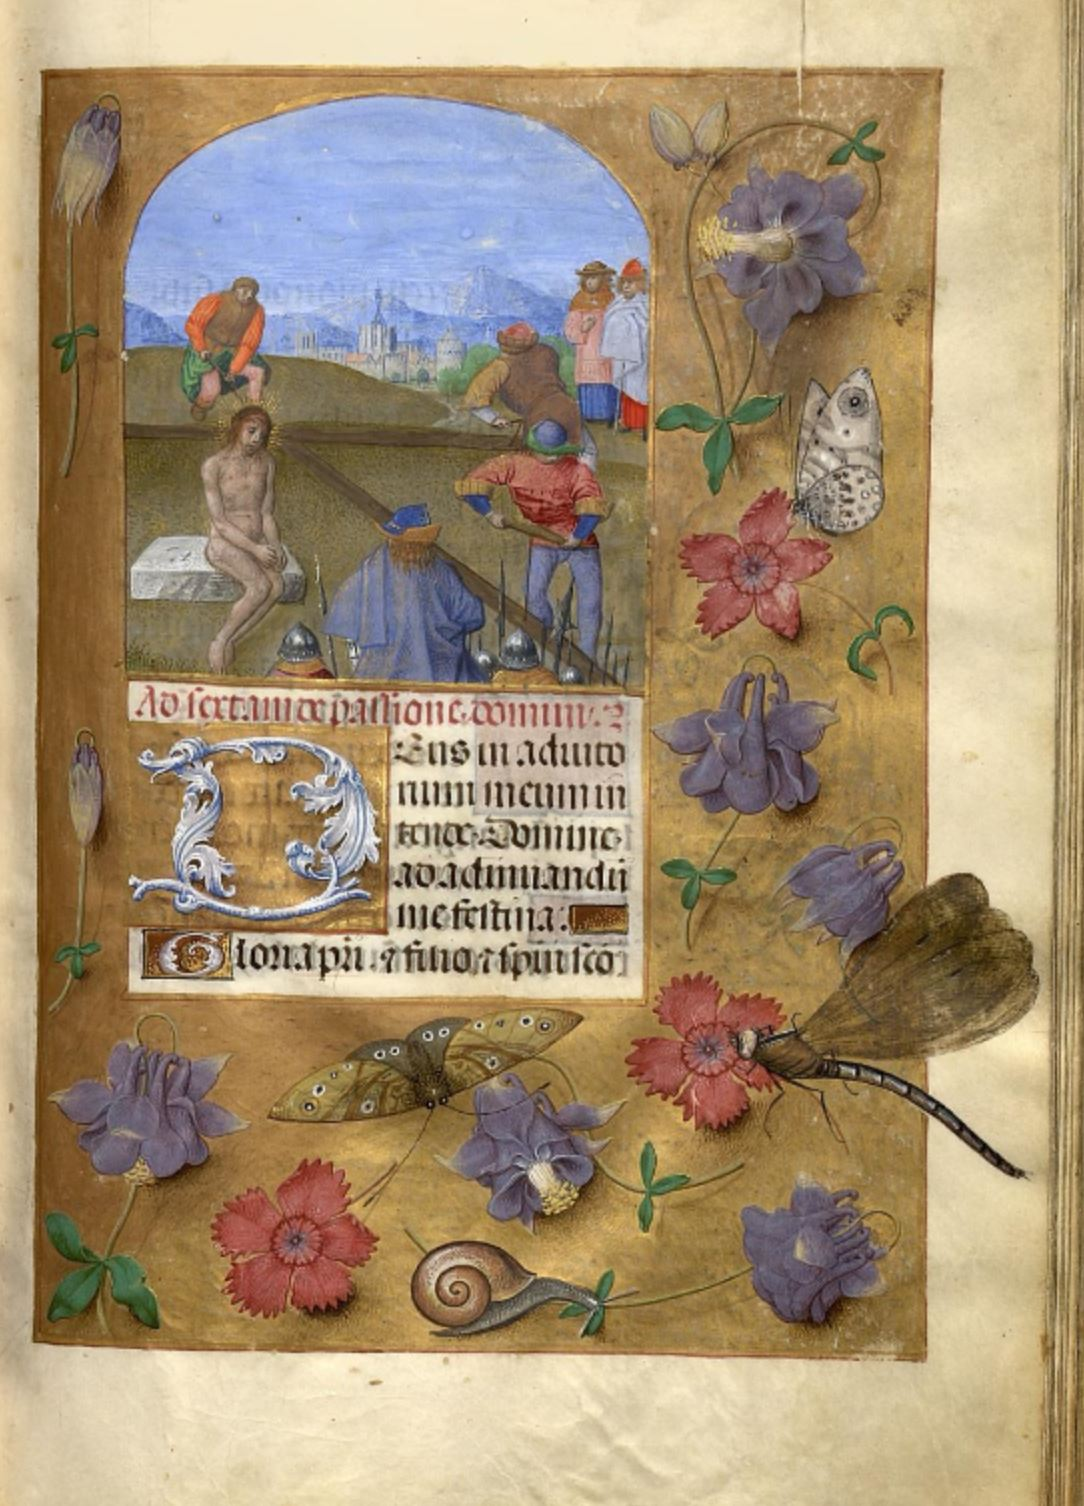 1483-98 Horae Beatae Mariae Virginis (La Flora, pour Charles VIII) Biblioteca nazionale Napoli Ms. I. B. 51 fol 45